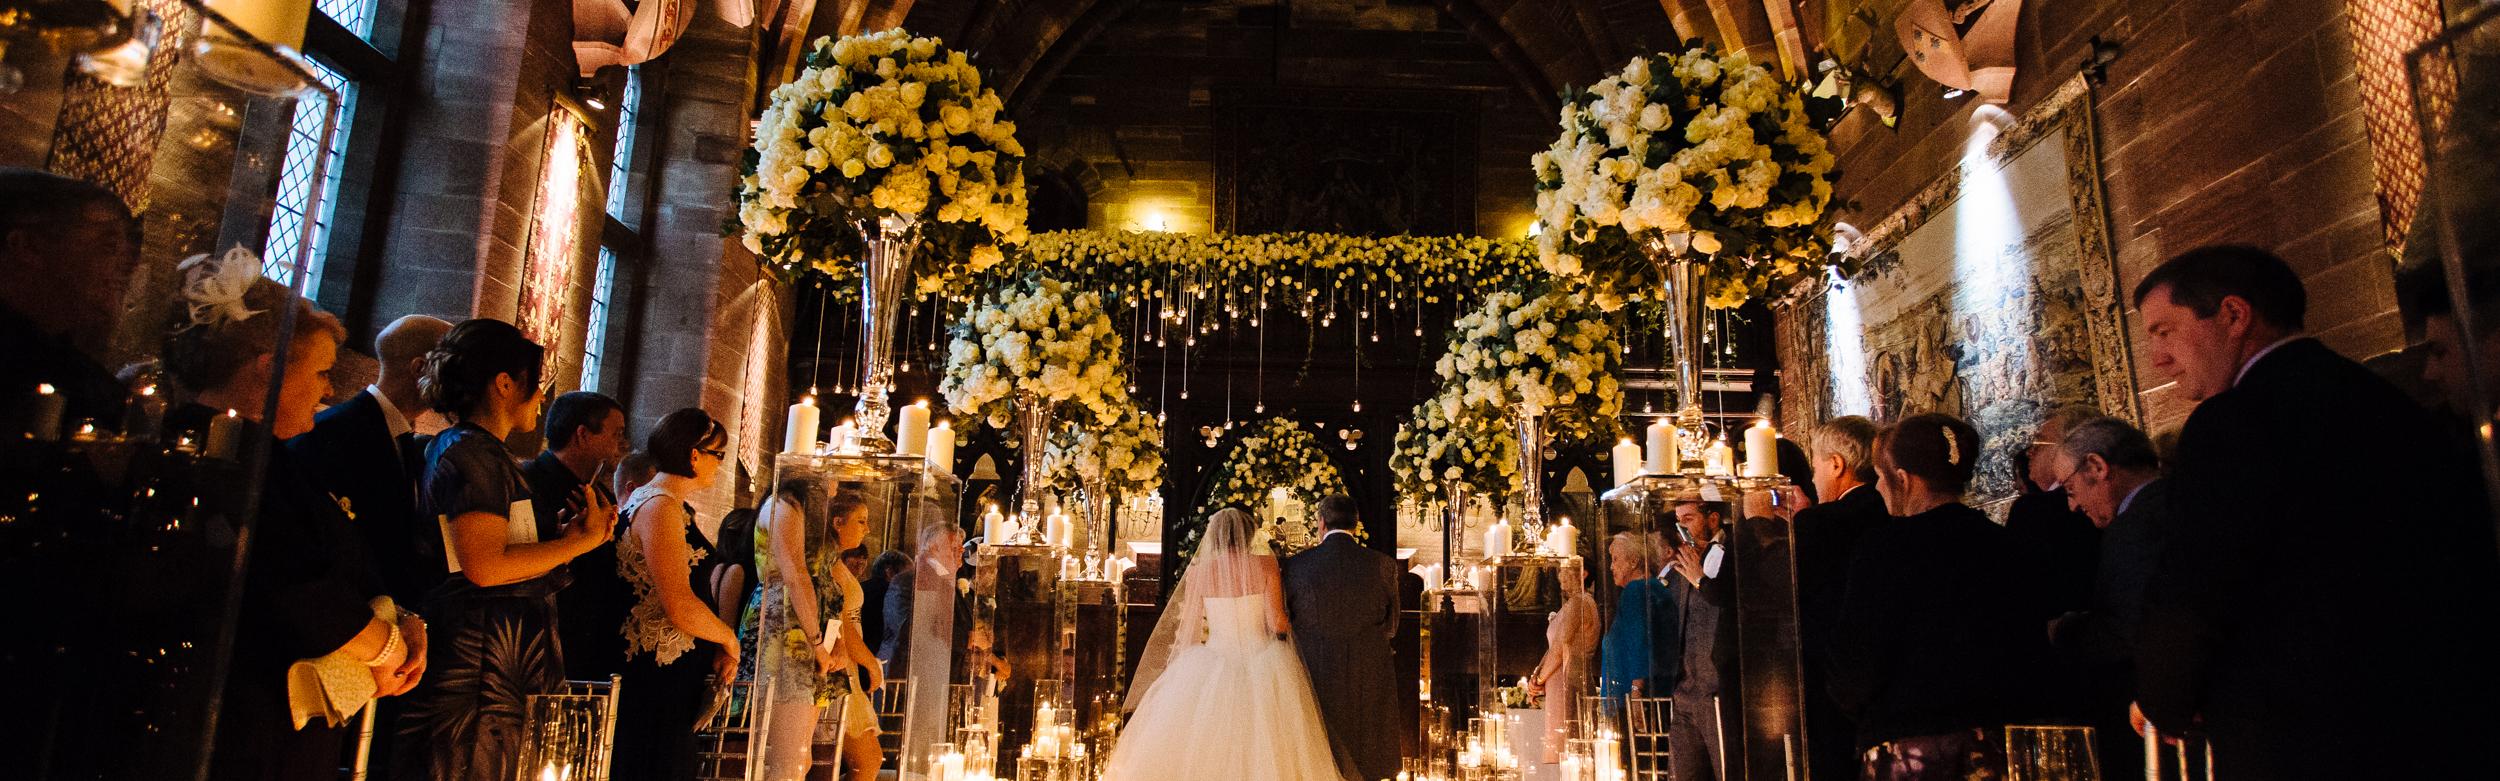 Unique weddings events guest feature dine junglespirit Gallery